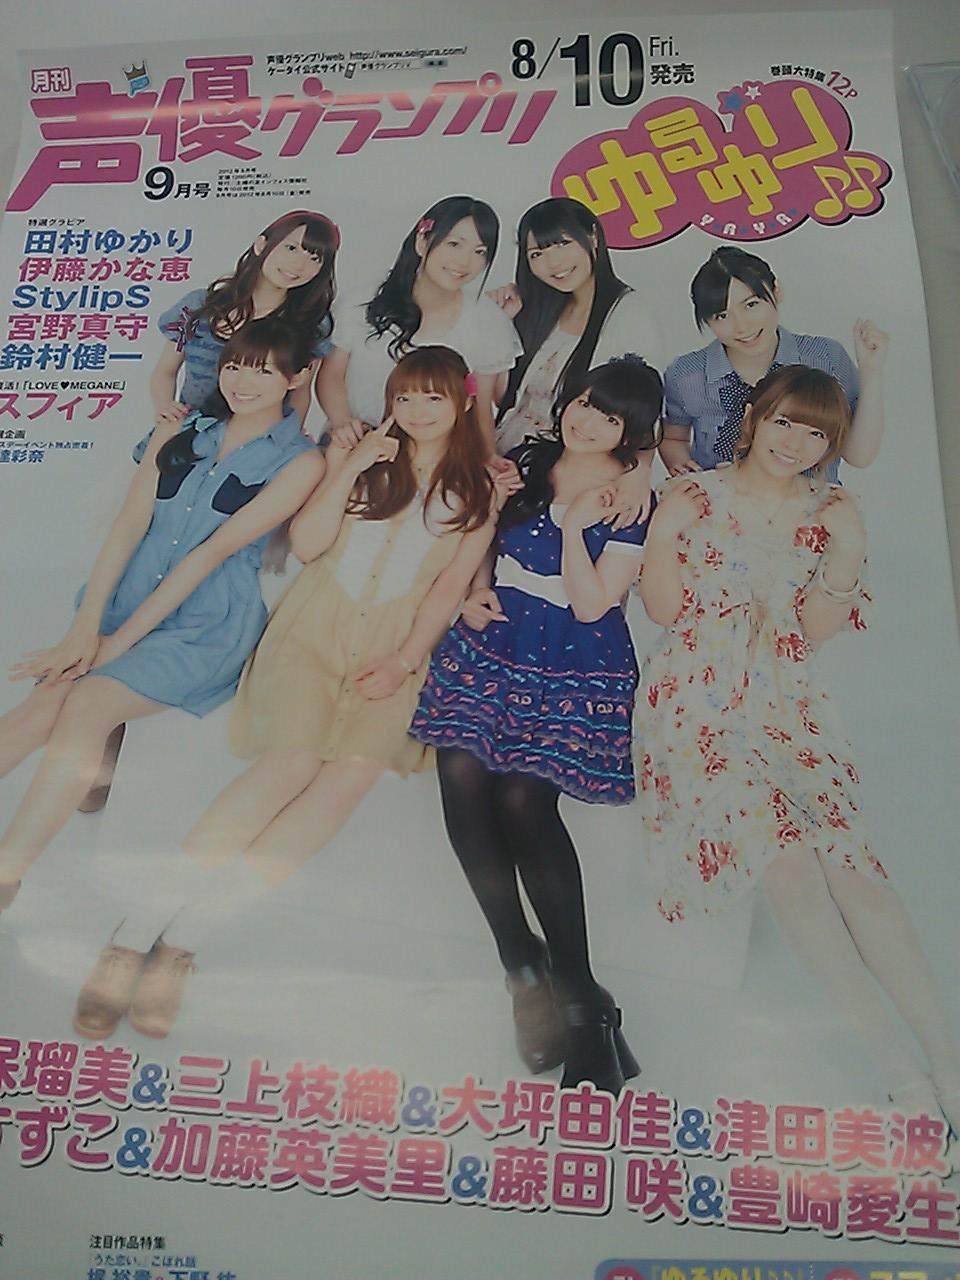 http://blog-imgs-45.fc2.com/a/n/k/ankosokuho/yHtFp.jpg